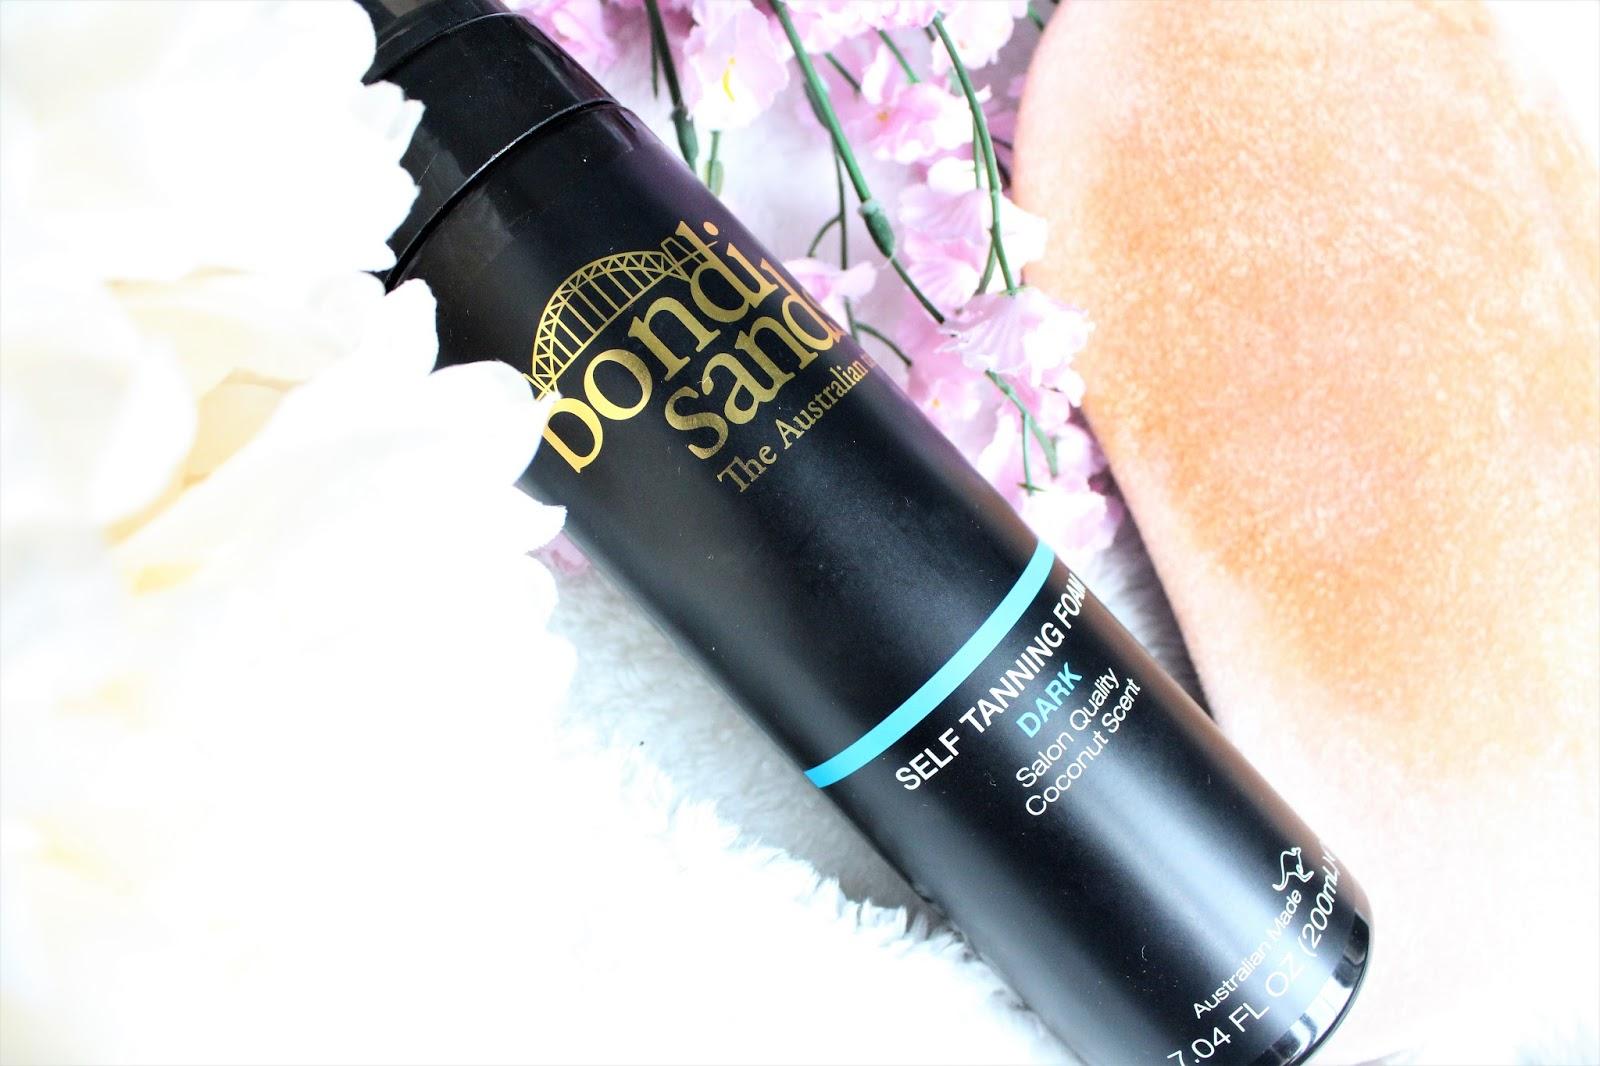 bondi sands dark tanning foam review